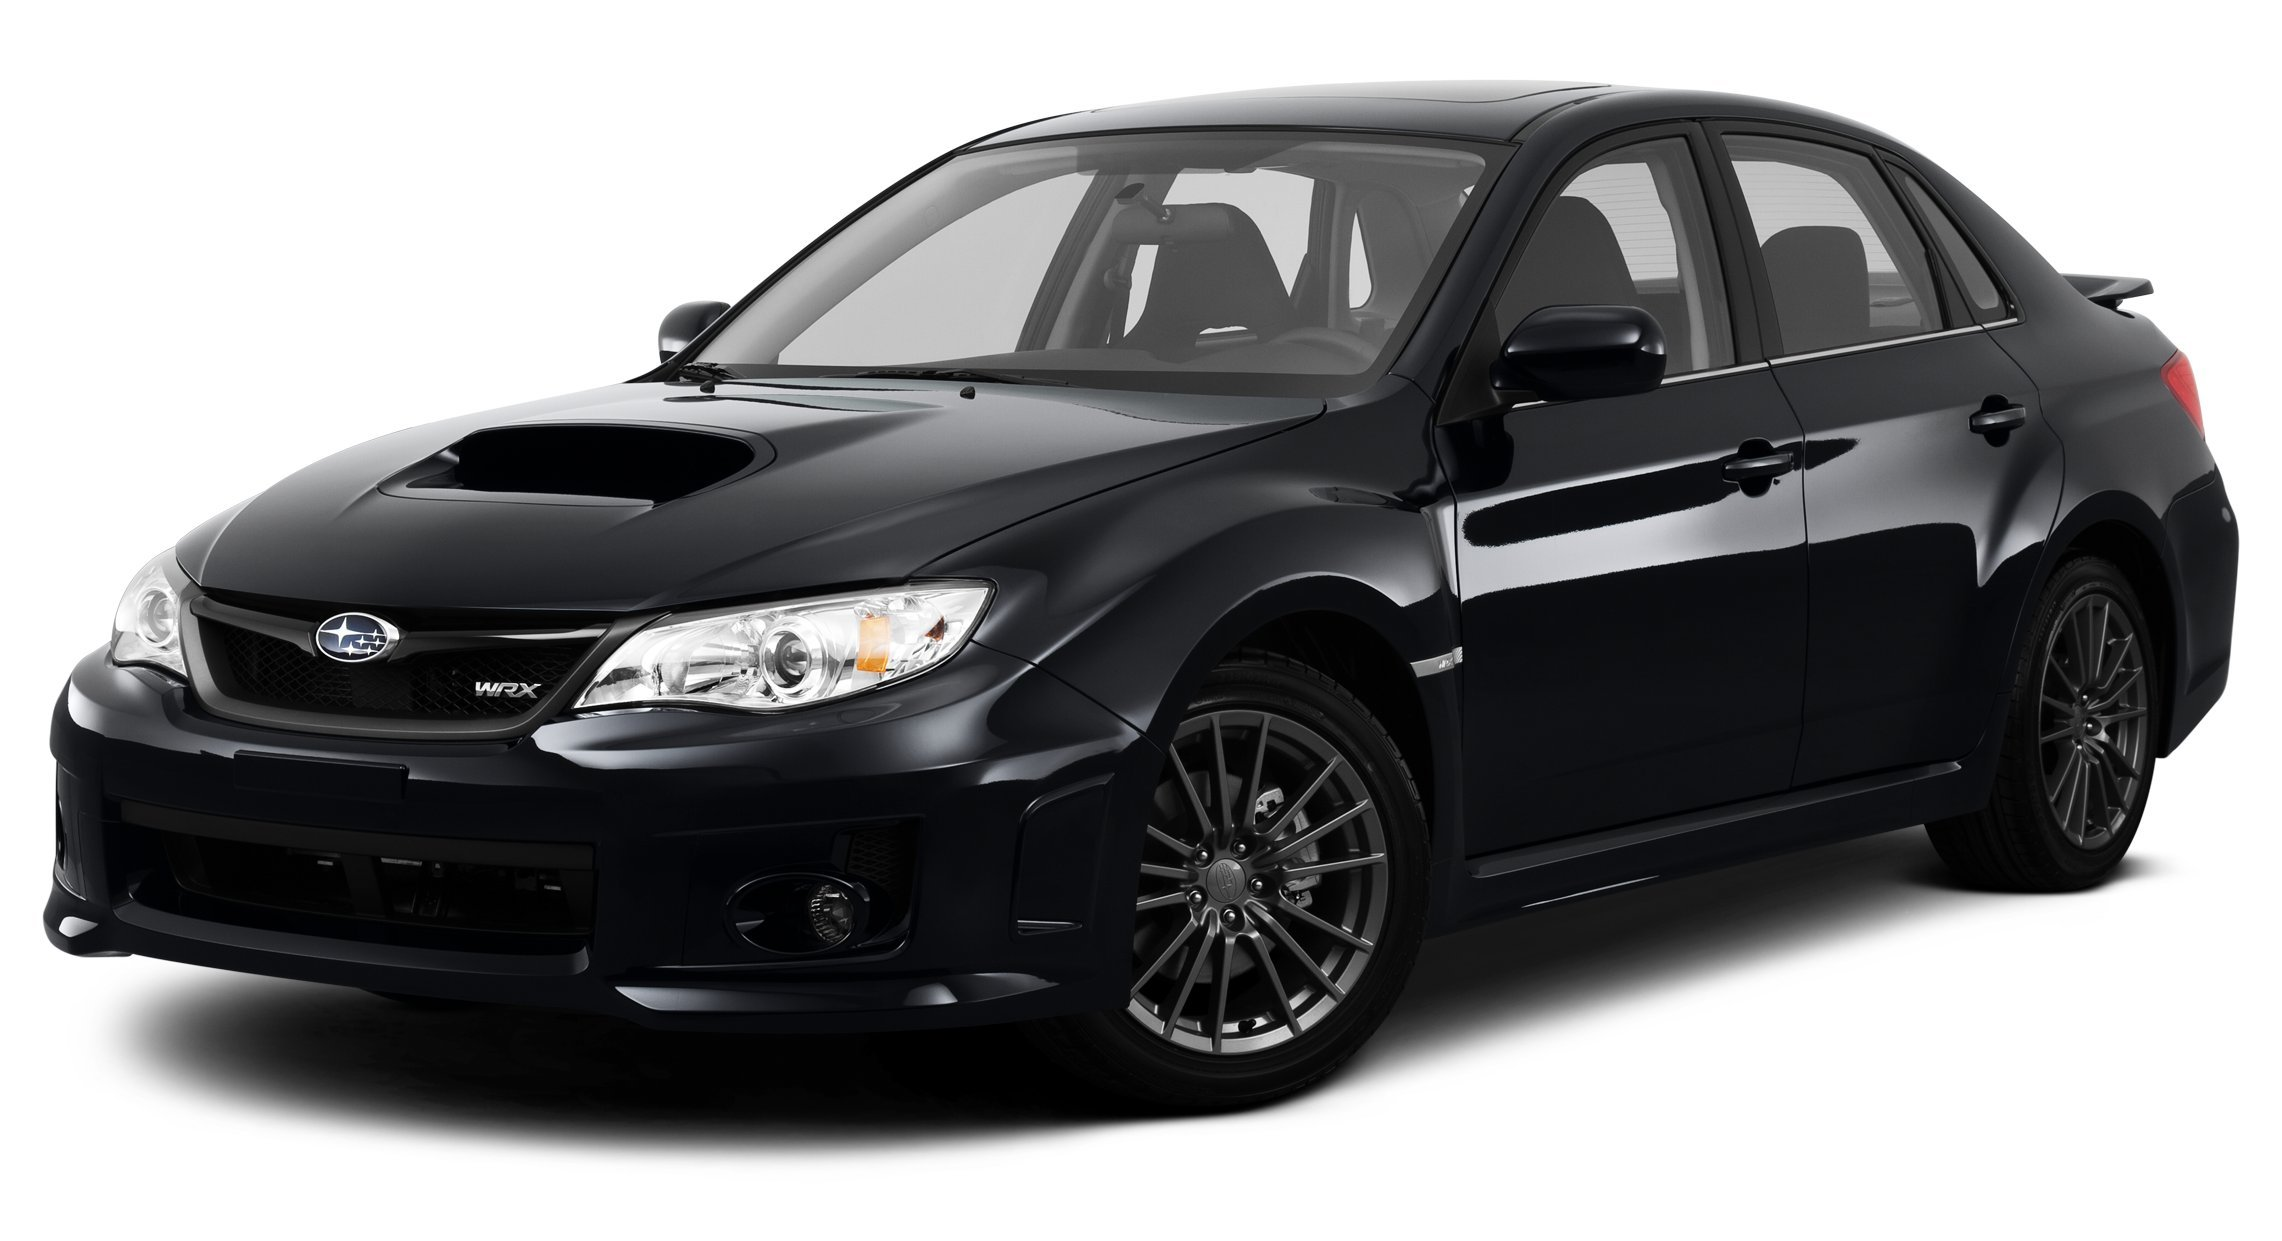 Amazon 2013 subaru impreza reviews images and specs vehicles 2013 subaru impreza wrx 4 door manual transmission vanachro Images